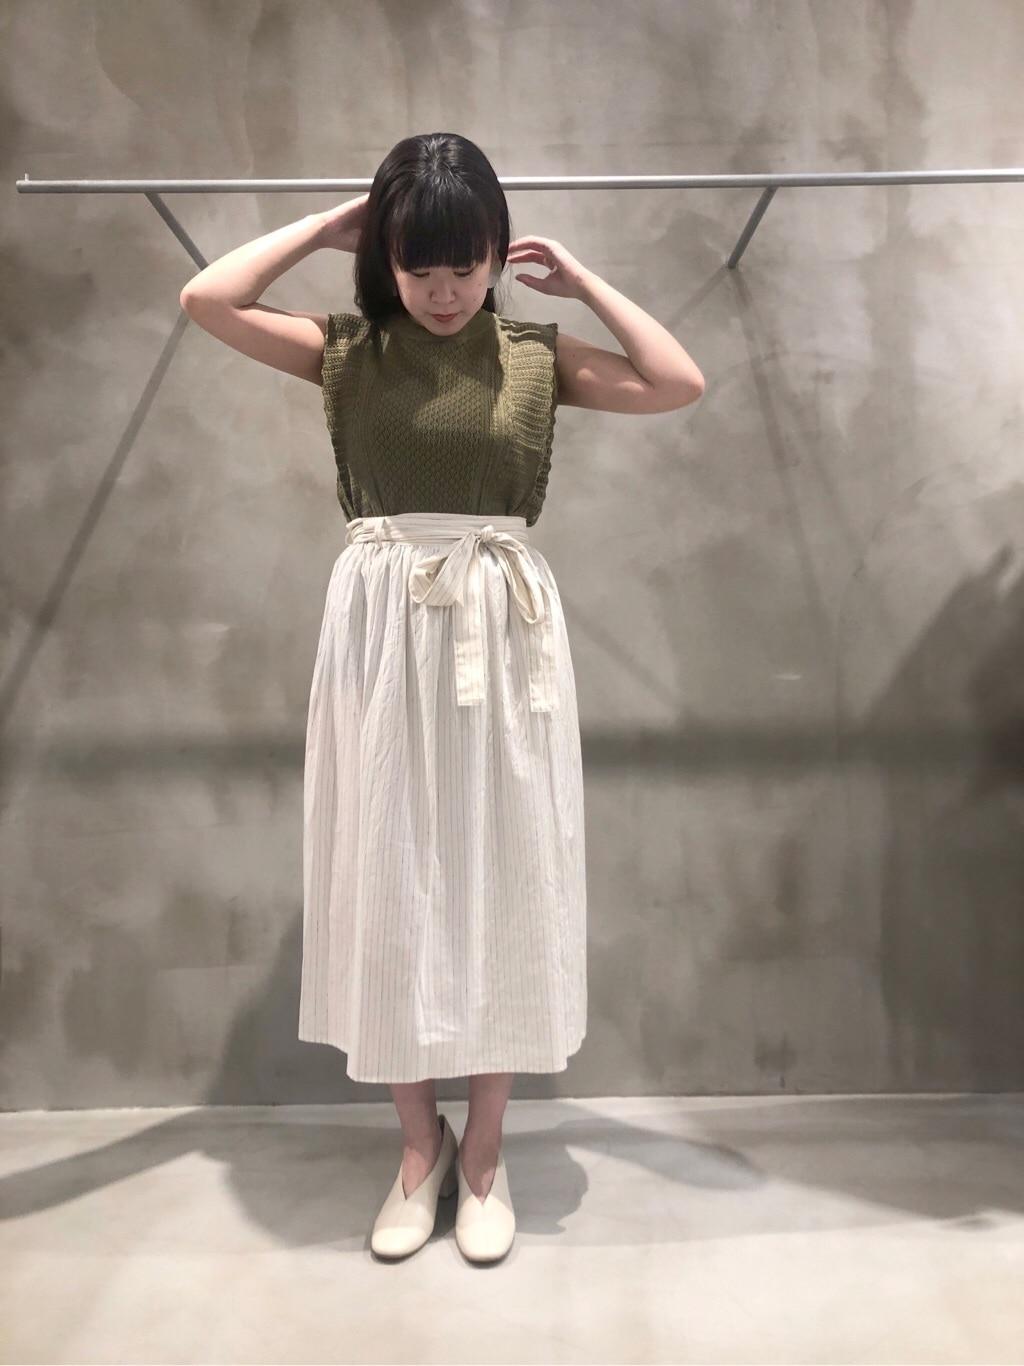 bulle de savon 渋谷スクランブルスクエア 身長:157cm 2020.06.05